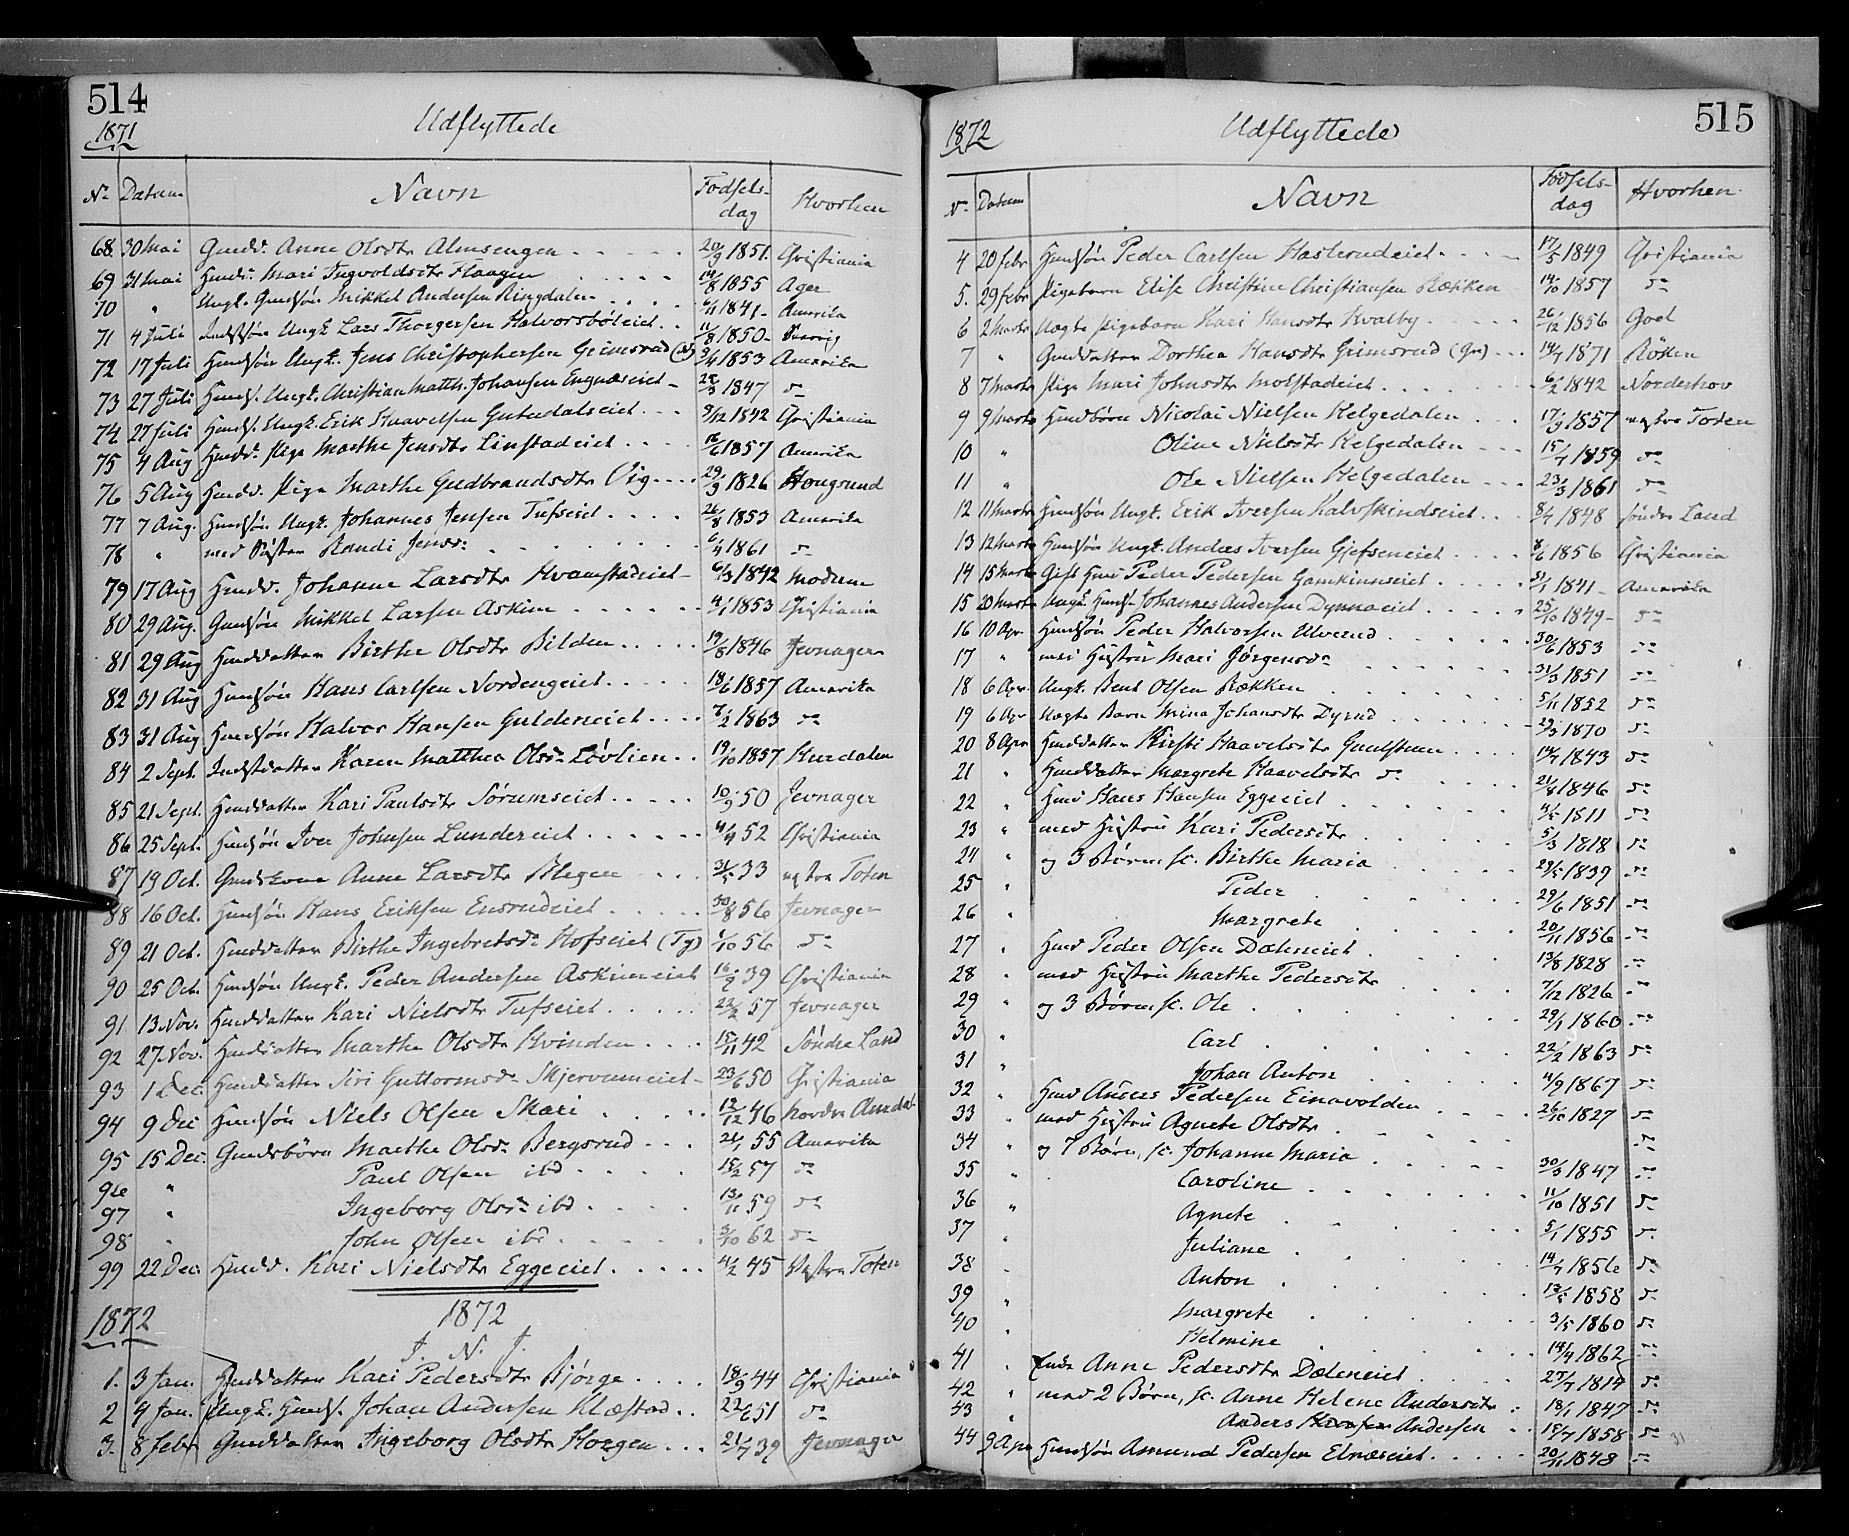 SAH, Gran prestekontor, Ministerialbok nr. 12, 1856-1874, s. 514-515